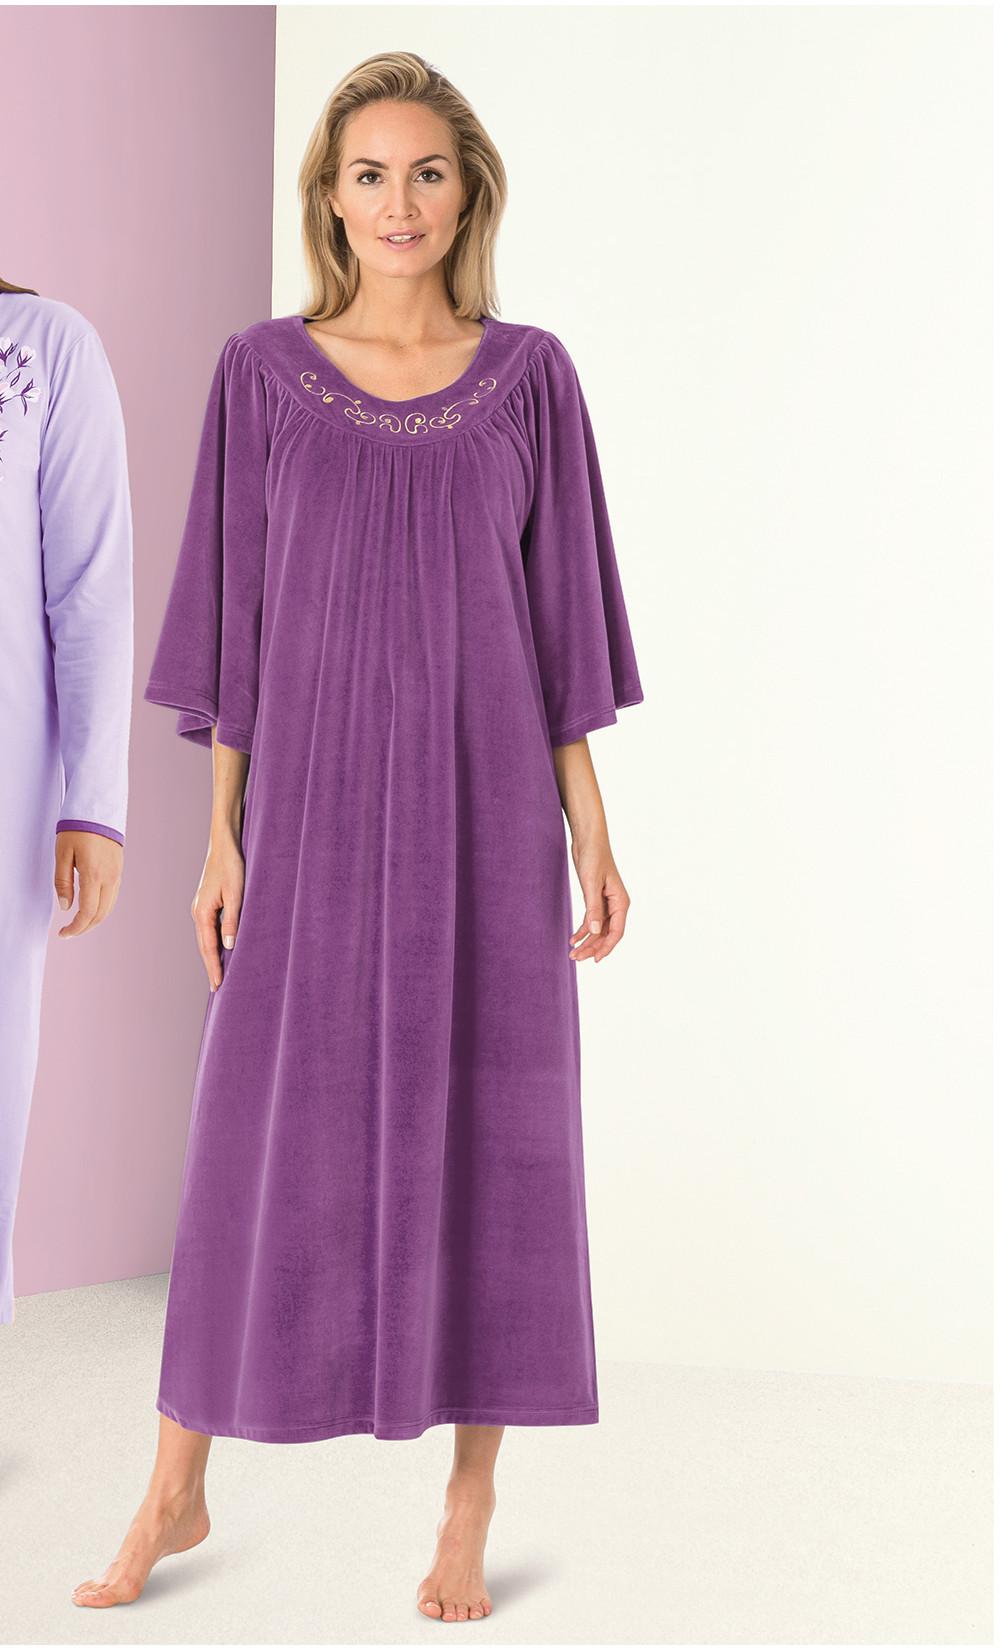 robe d'hôtesse - SAVY